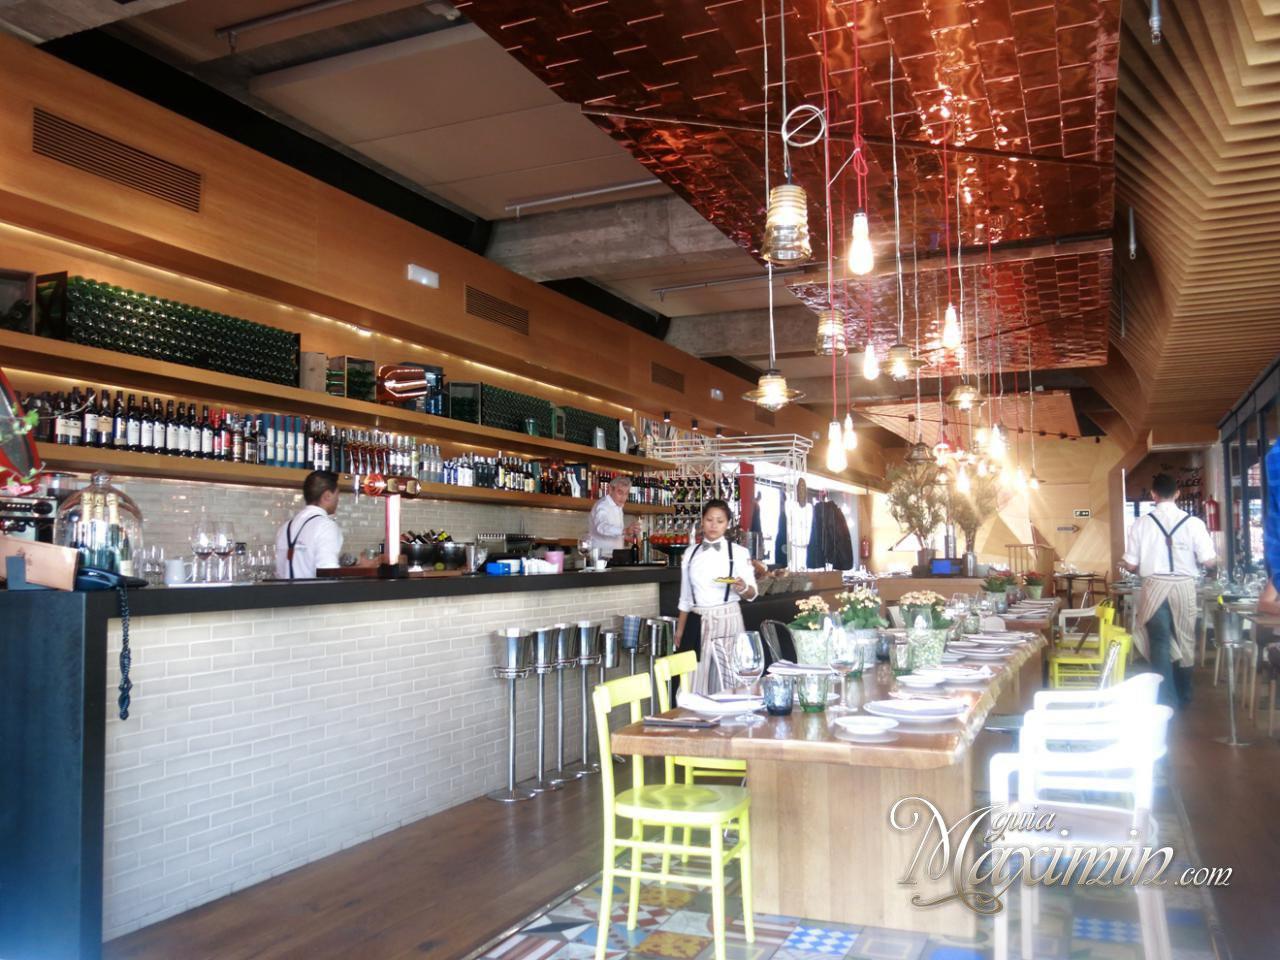 La gazpacher a refresca la cocina de san ant n madrid - La cocina de san anton madrid ...